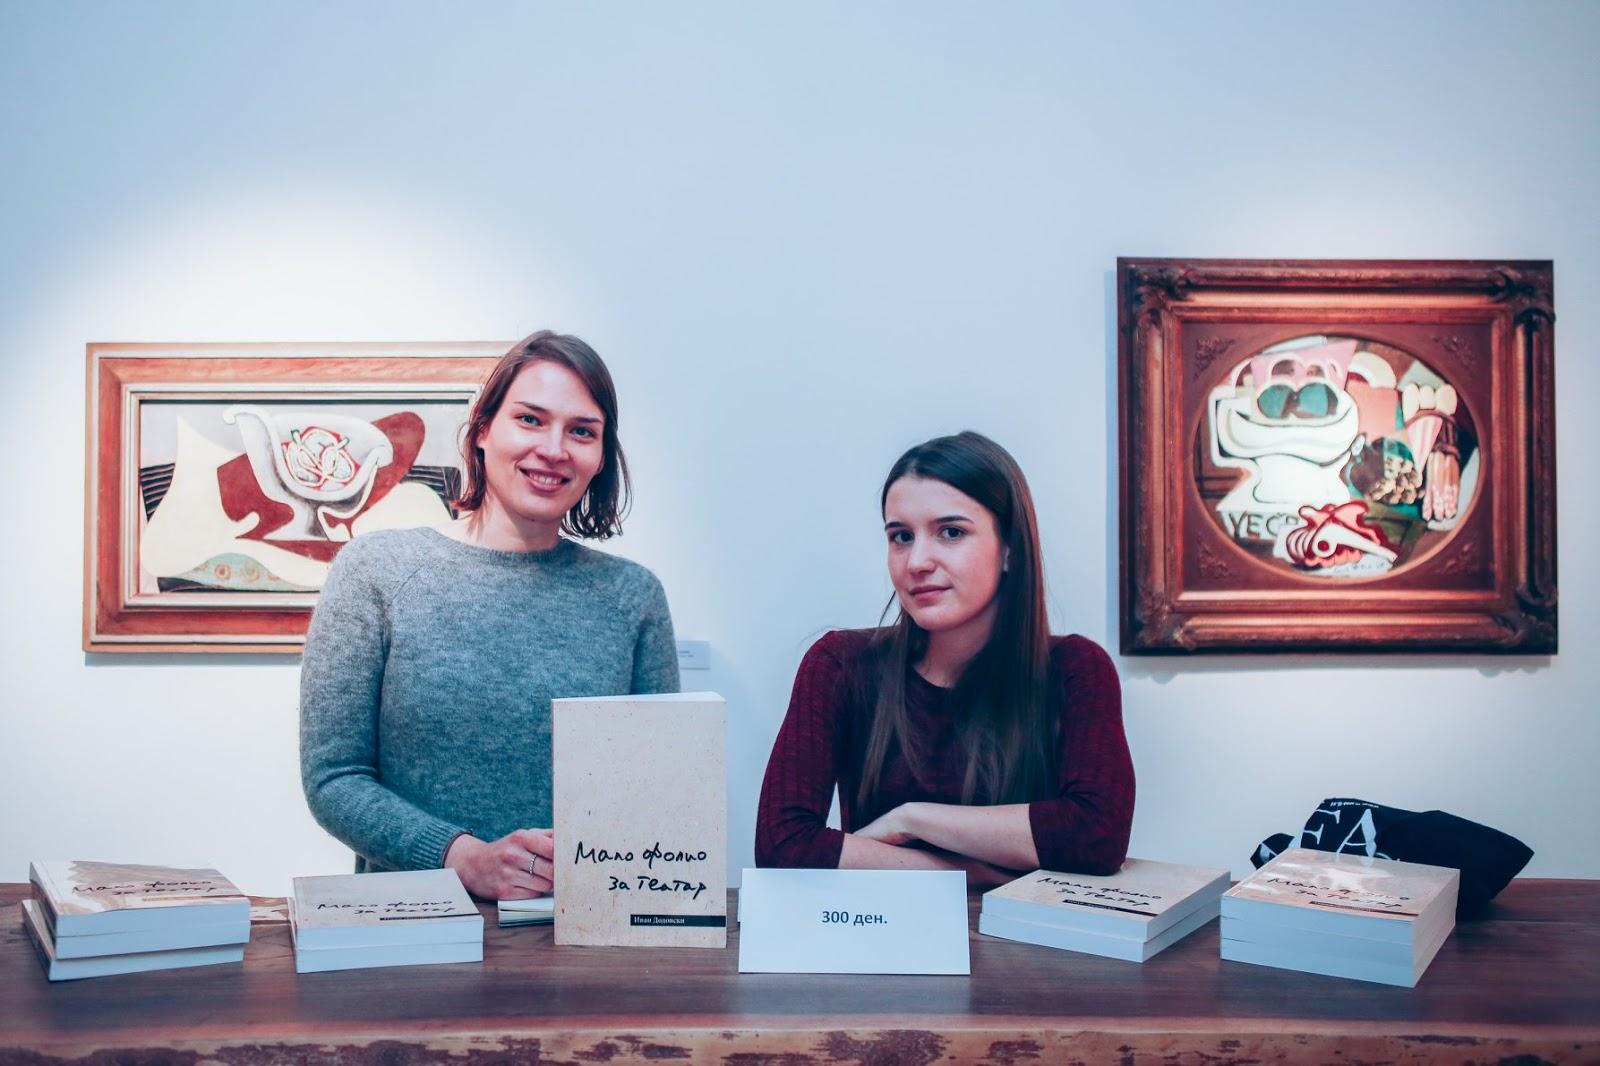 Organizers Eva Erika Semič and Тијана Ана